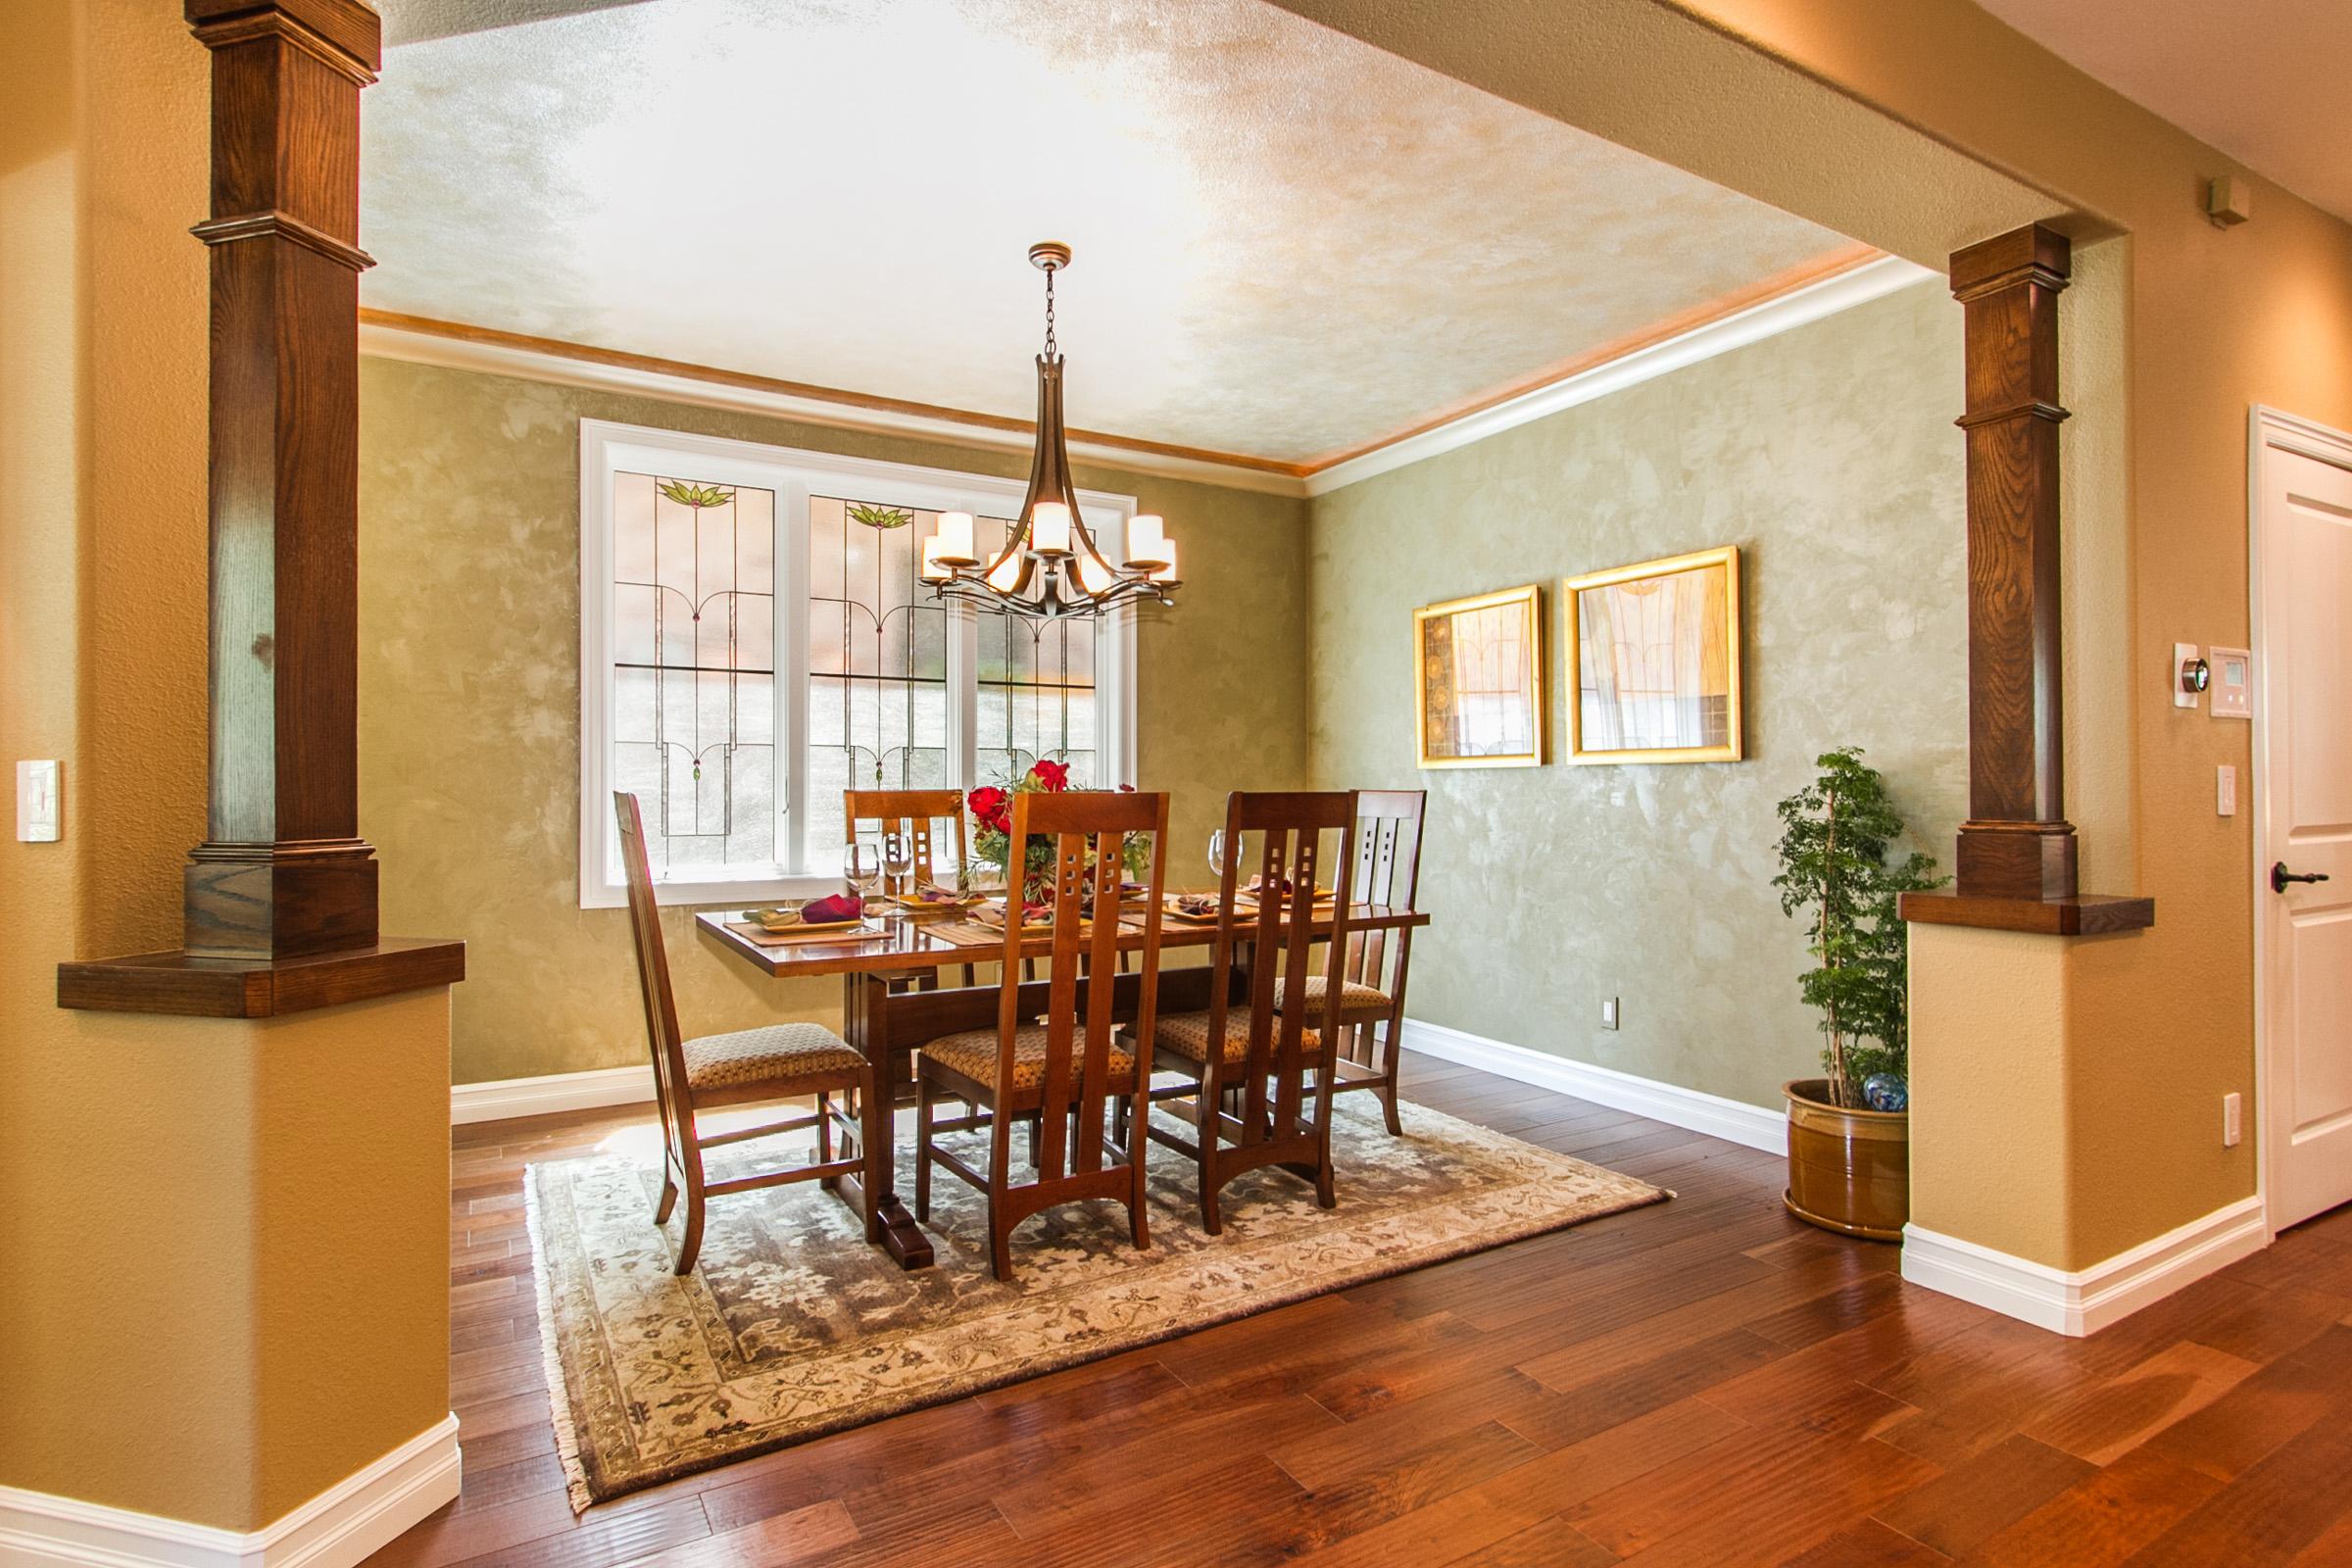 1368017_Gorgeous-Dining-Room_high.jpg